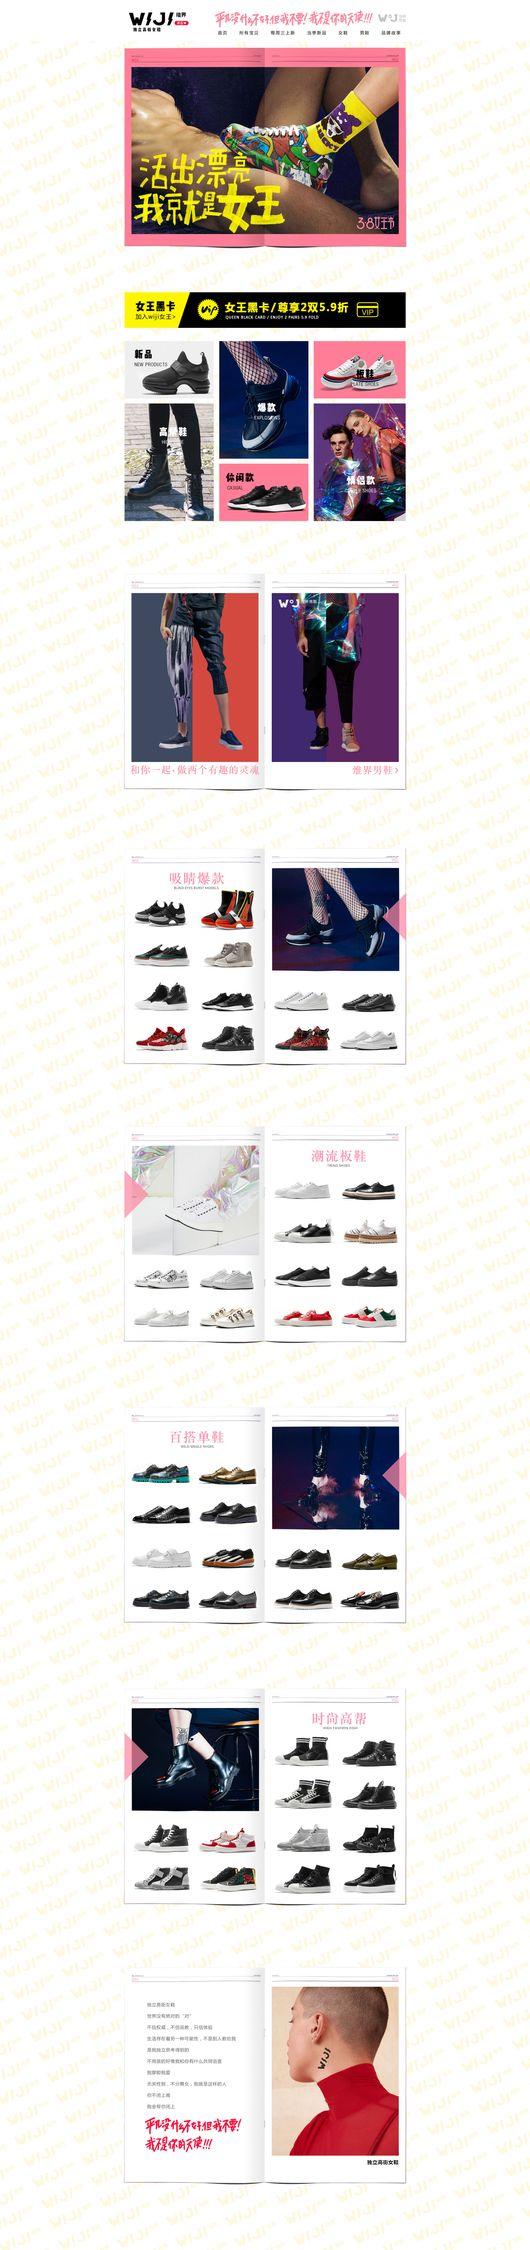 WIJI女鞋页面-品牌视觉 - puff1208   ello